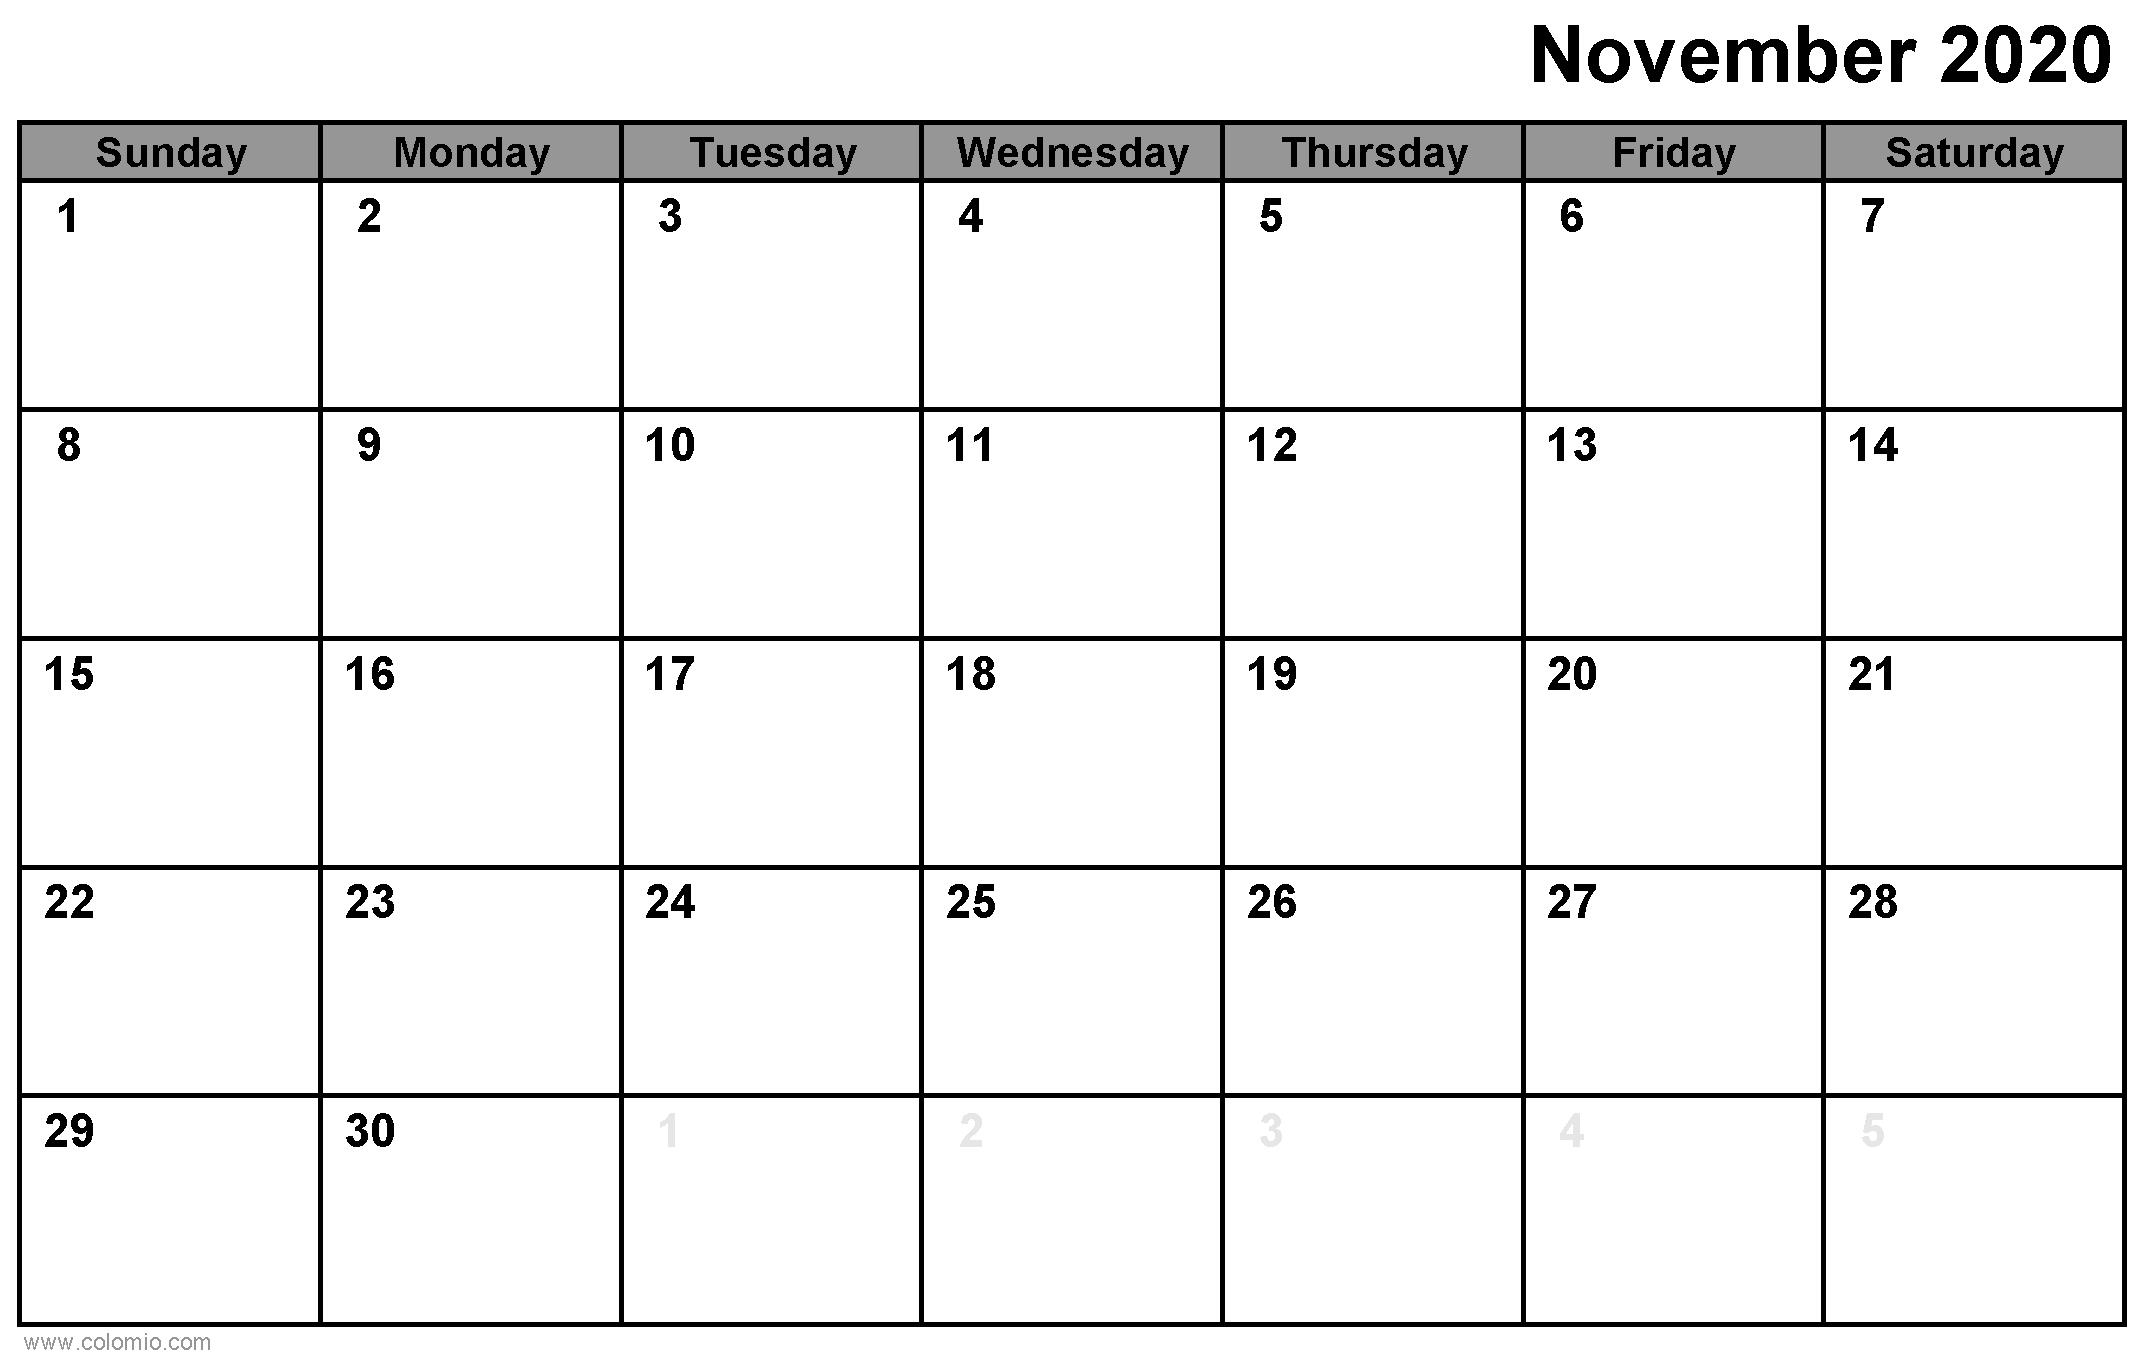 November 2020 Calendar printable